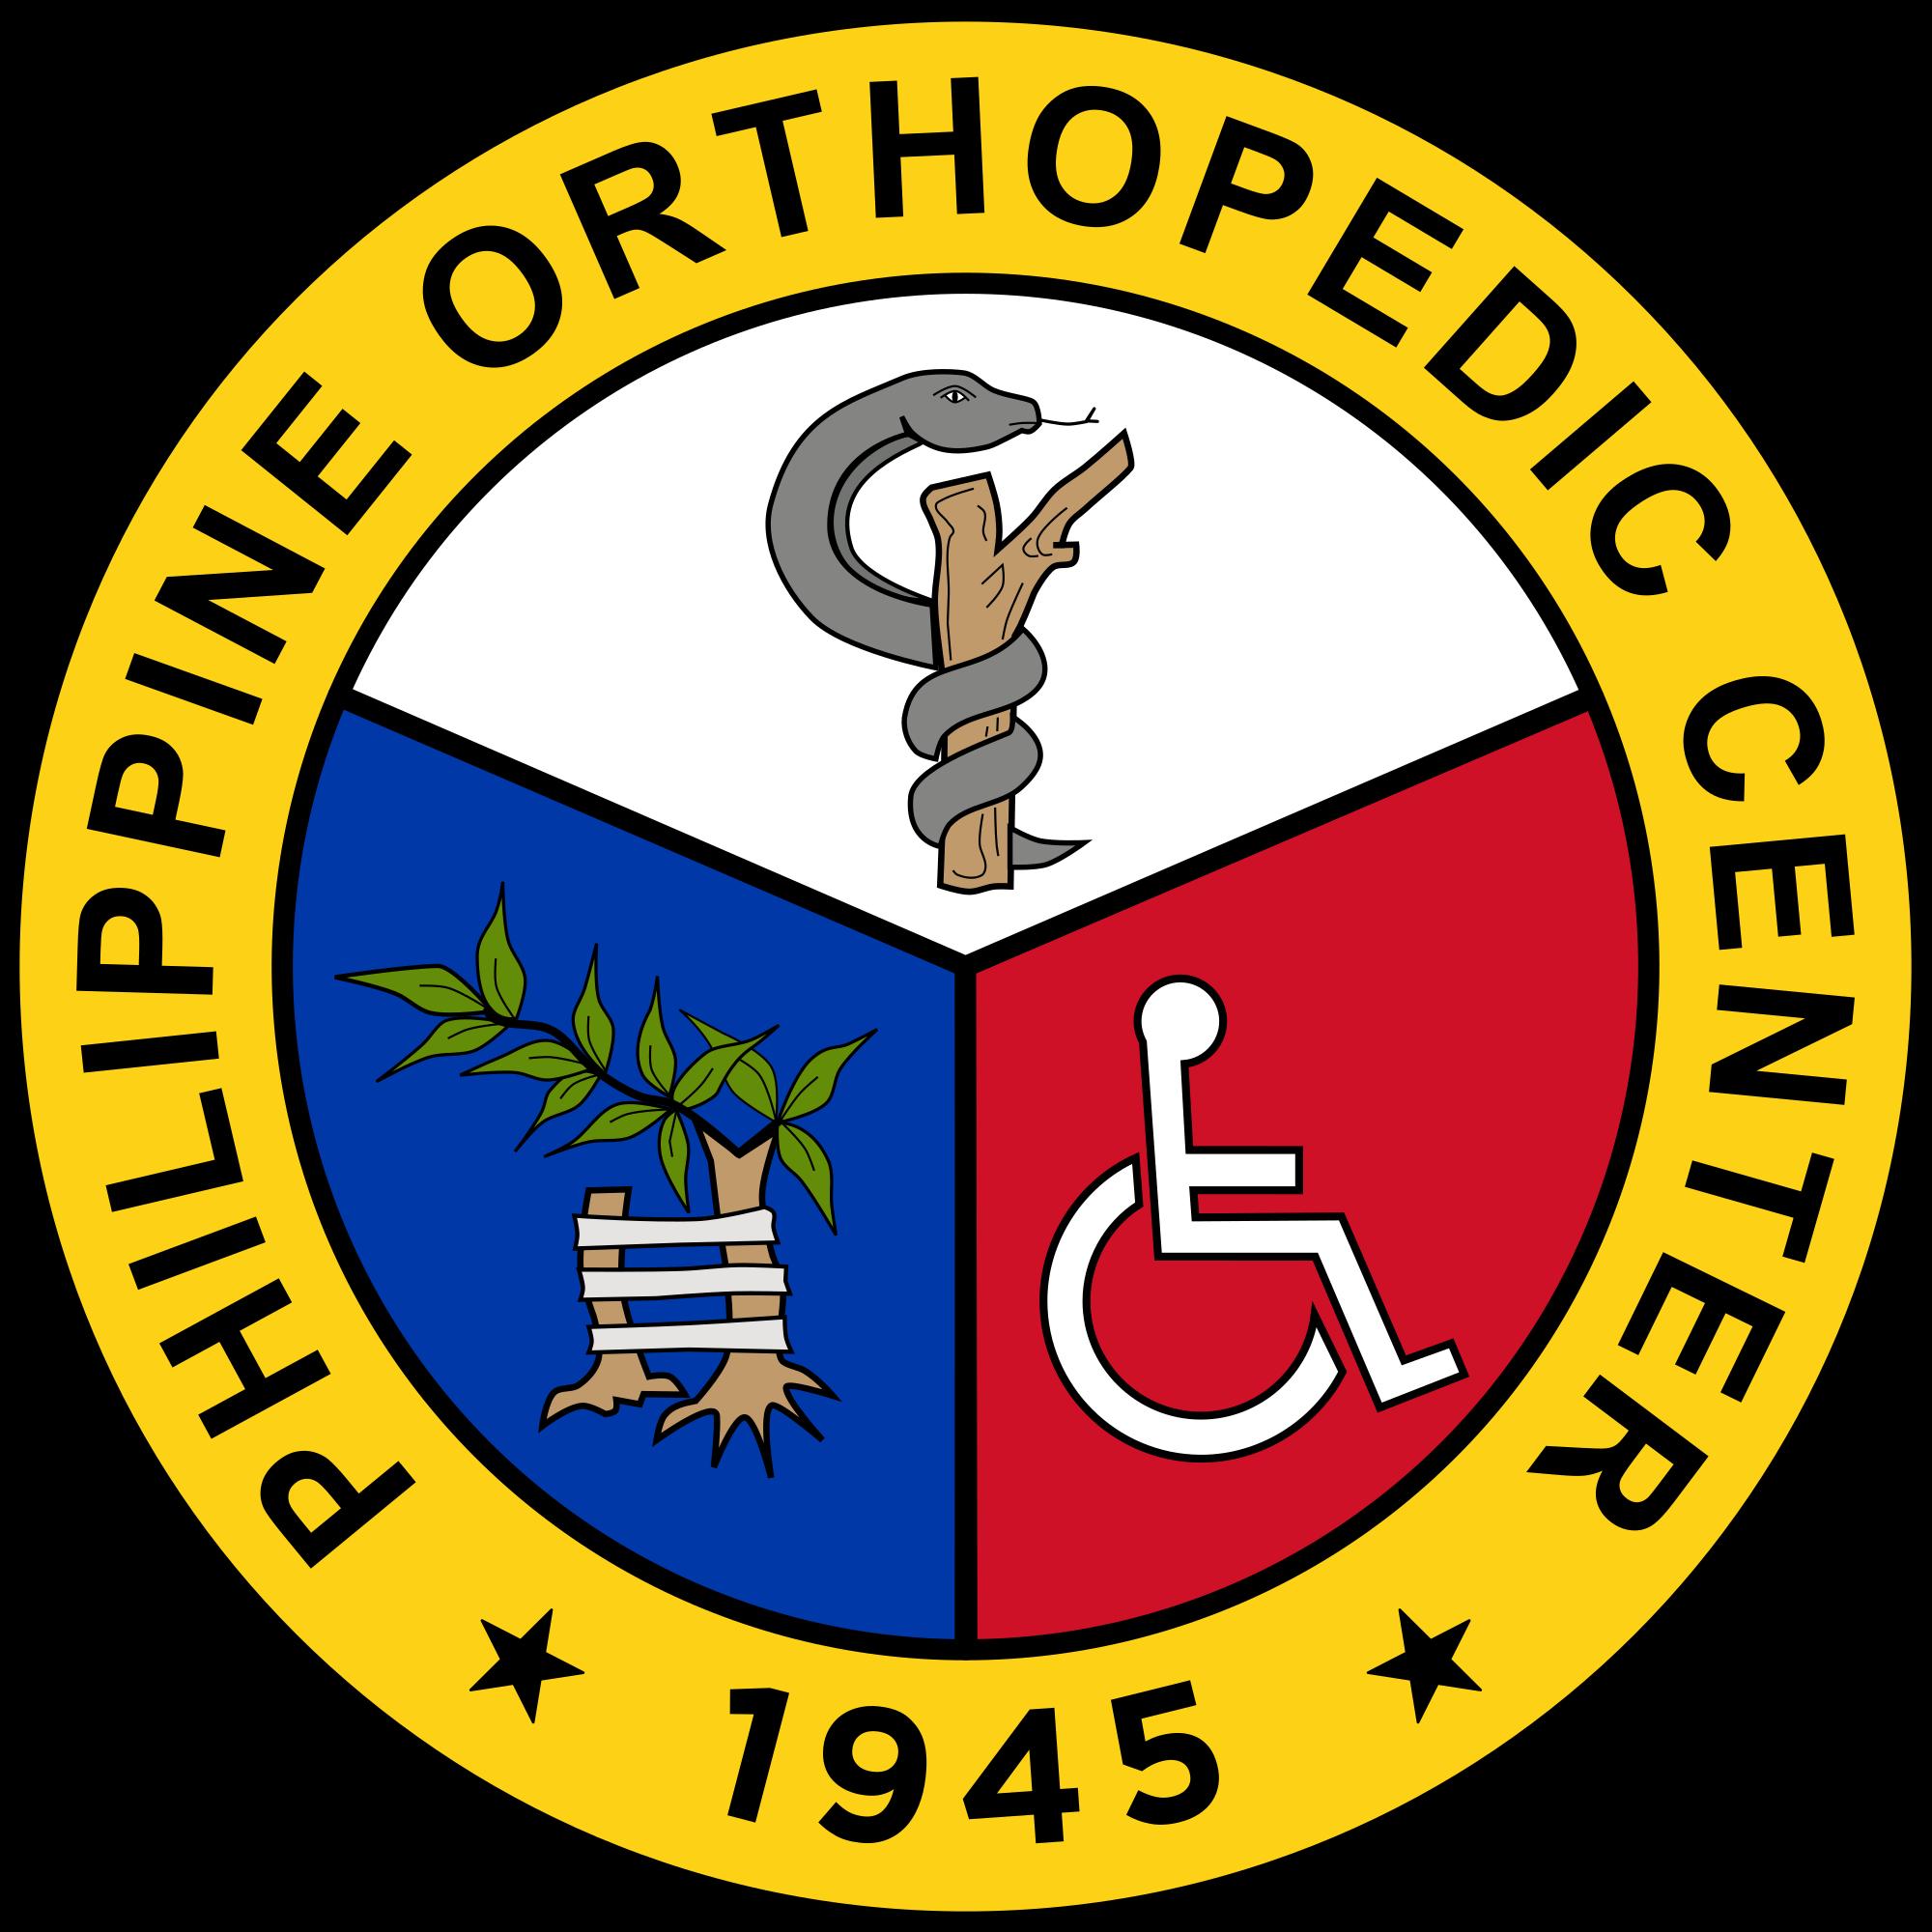 Tool clipart neurosurgeon. Philippine orthopedic center wikipedia